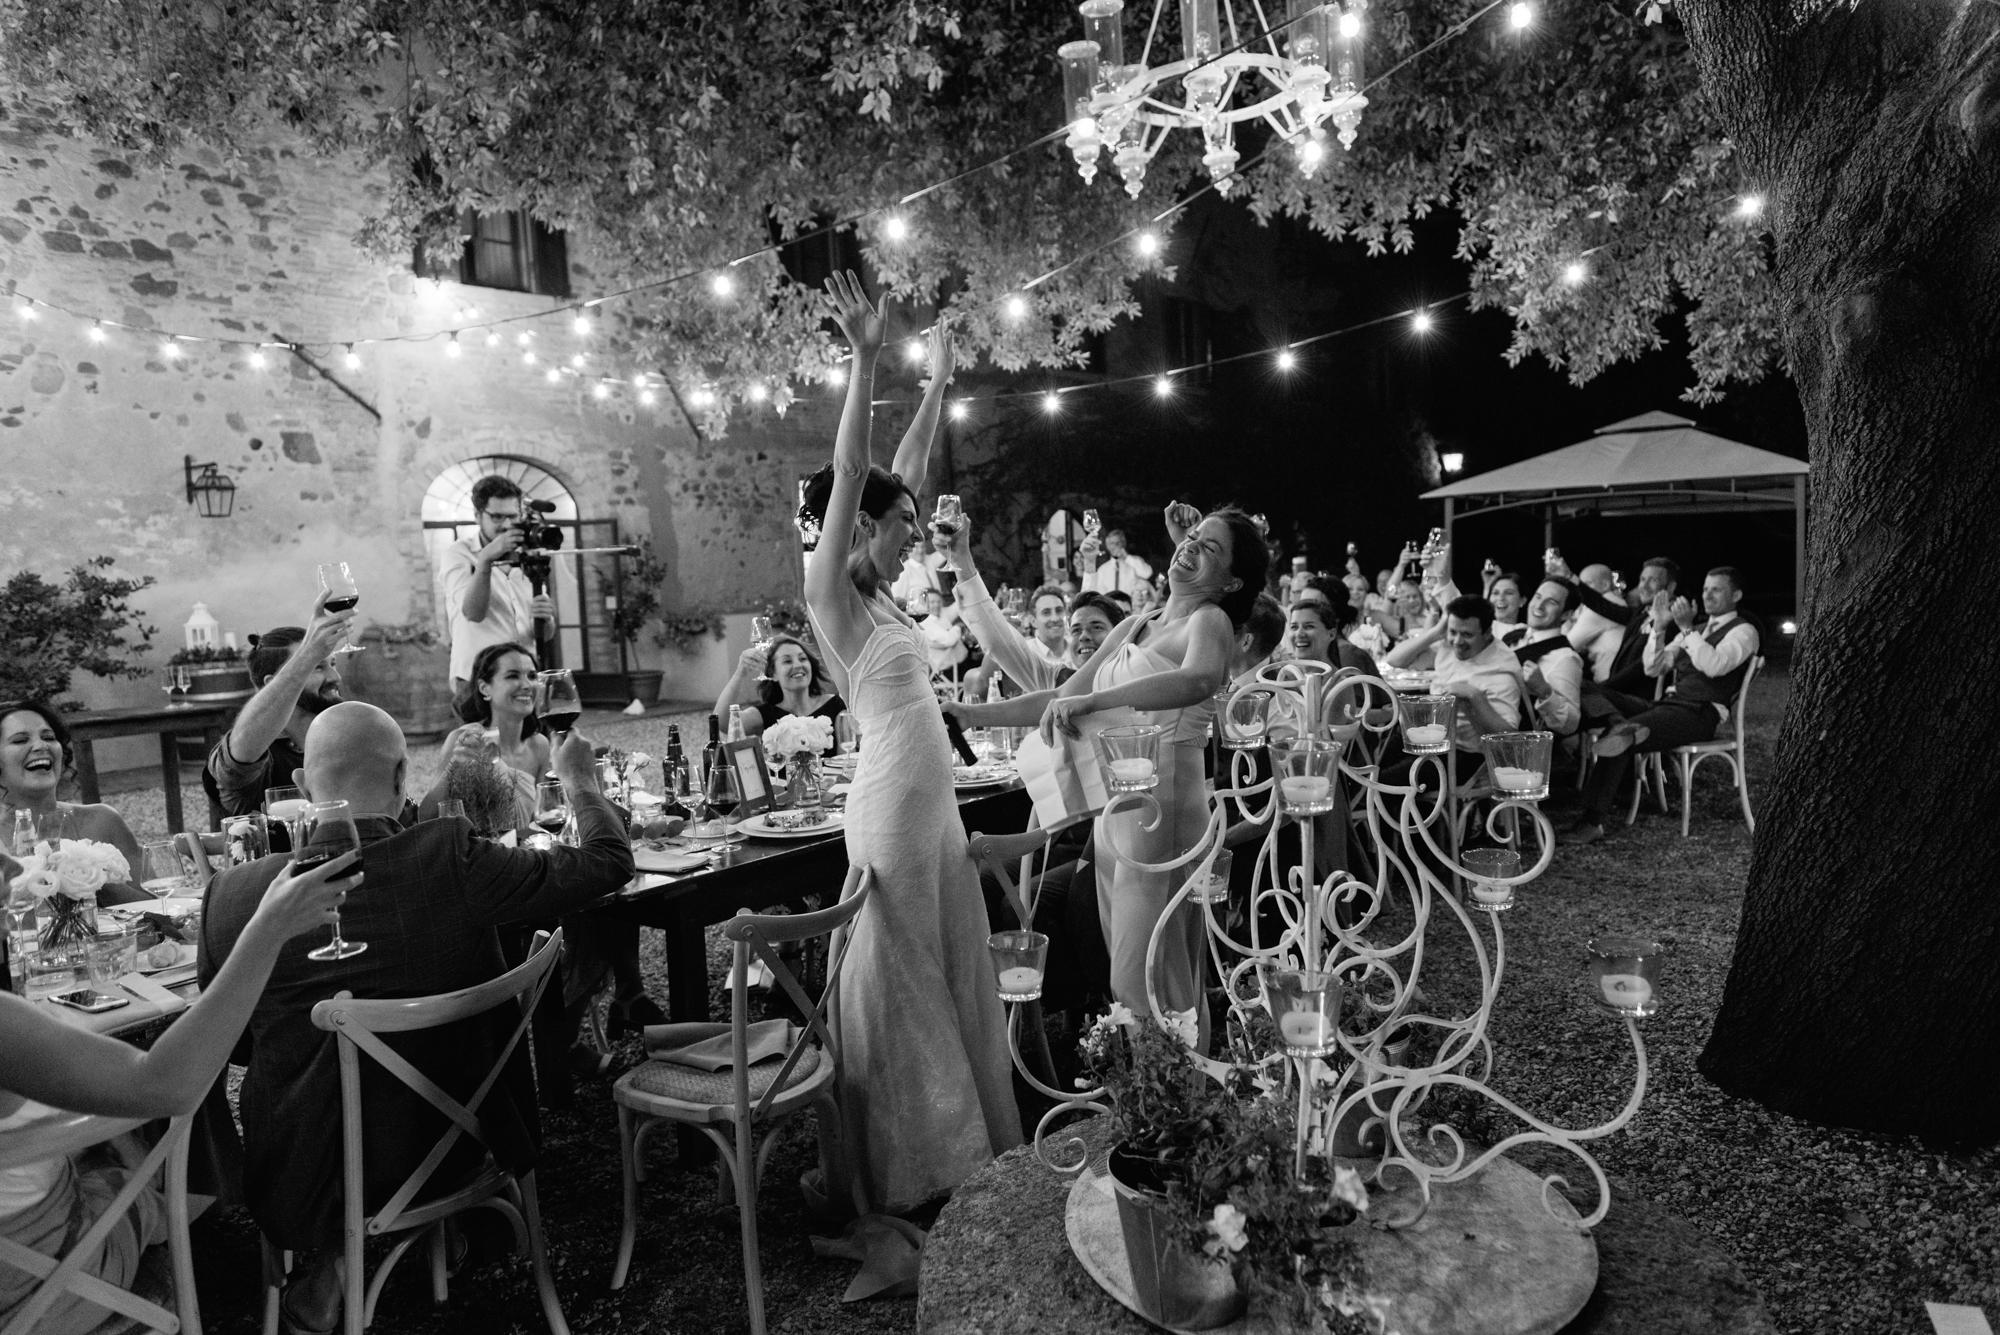 Wedding_Photographer_in_Tuscany_Italy-004.jpg